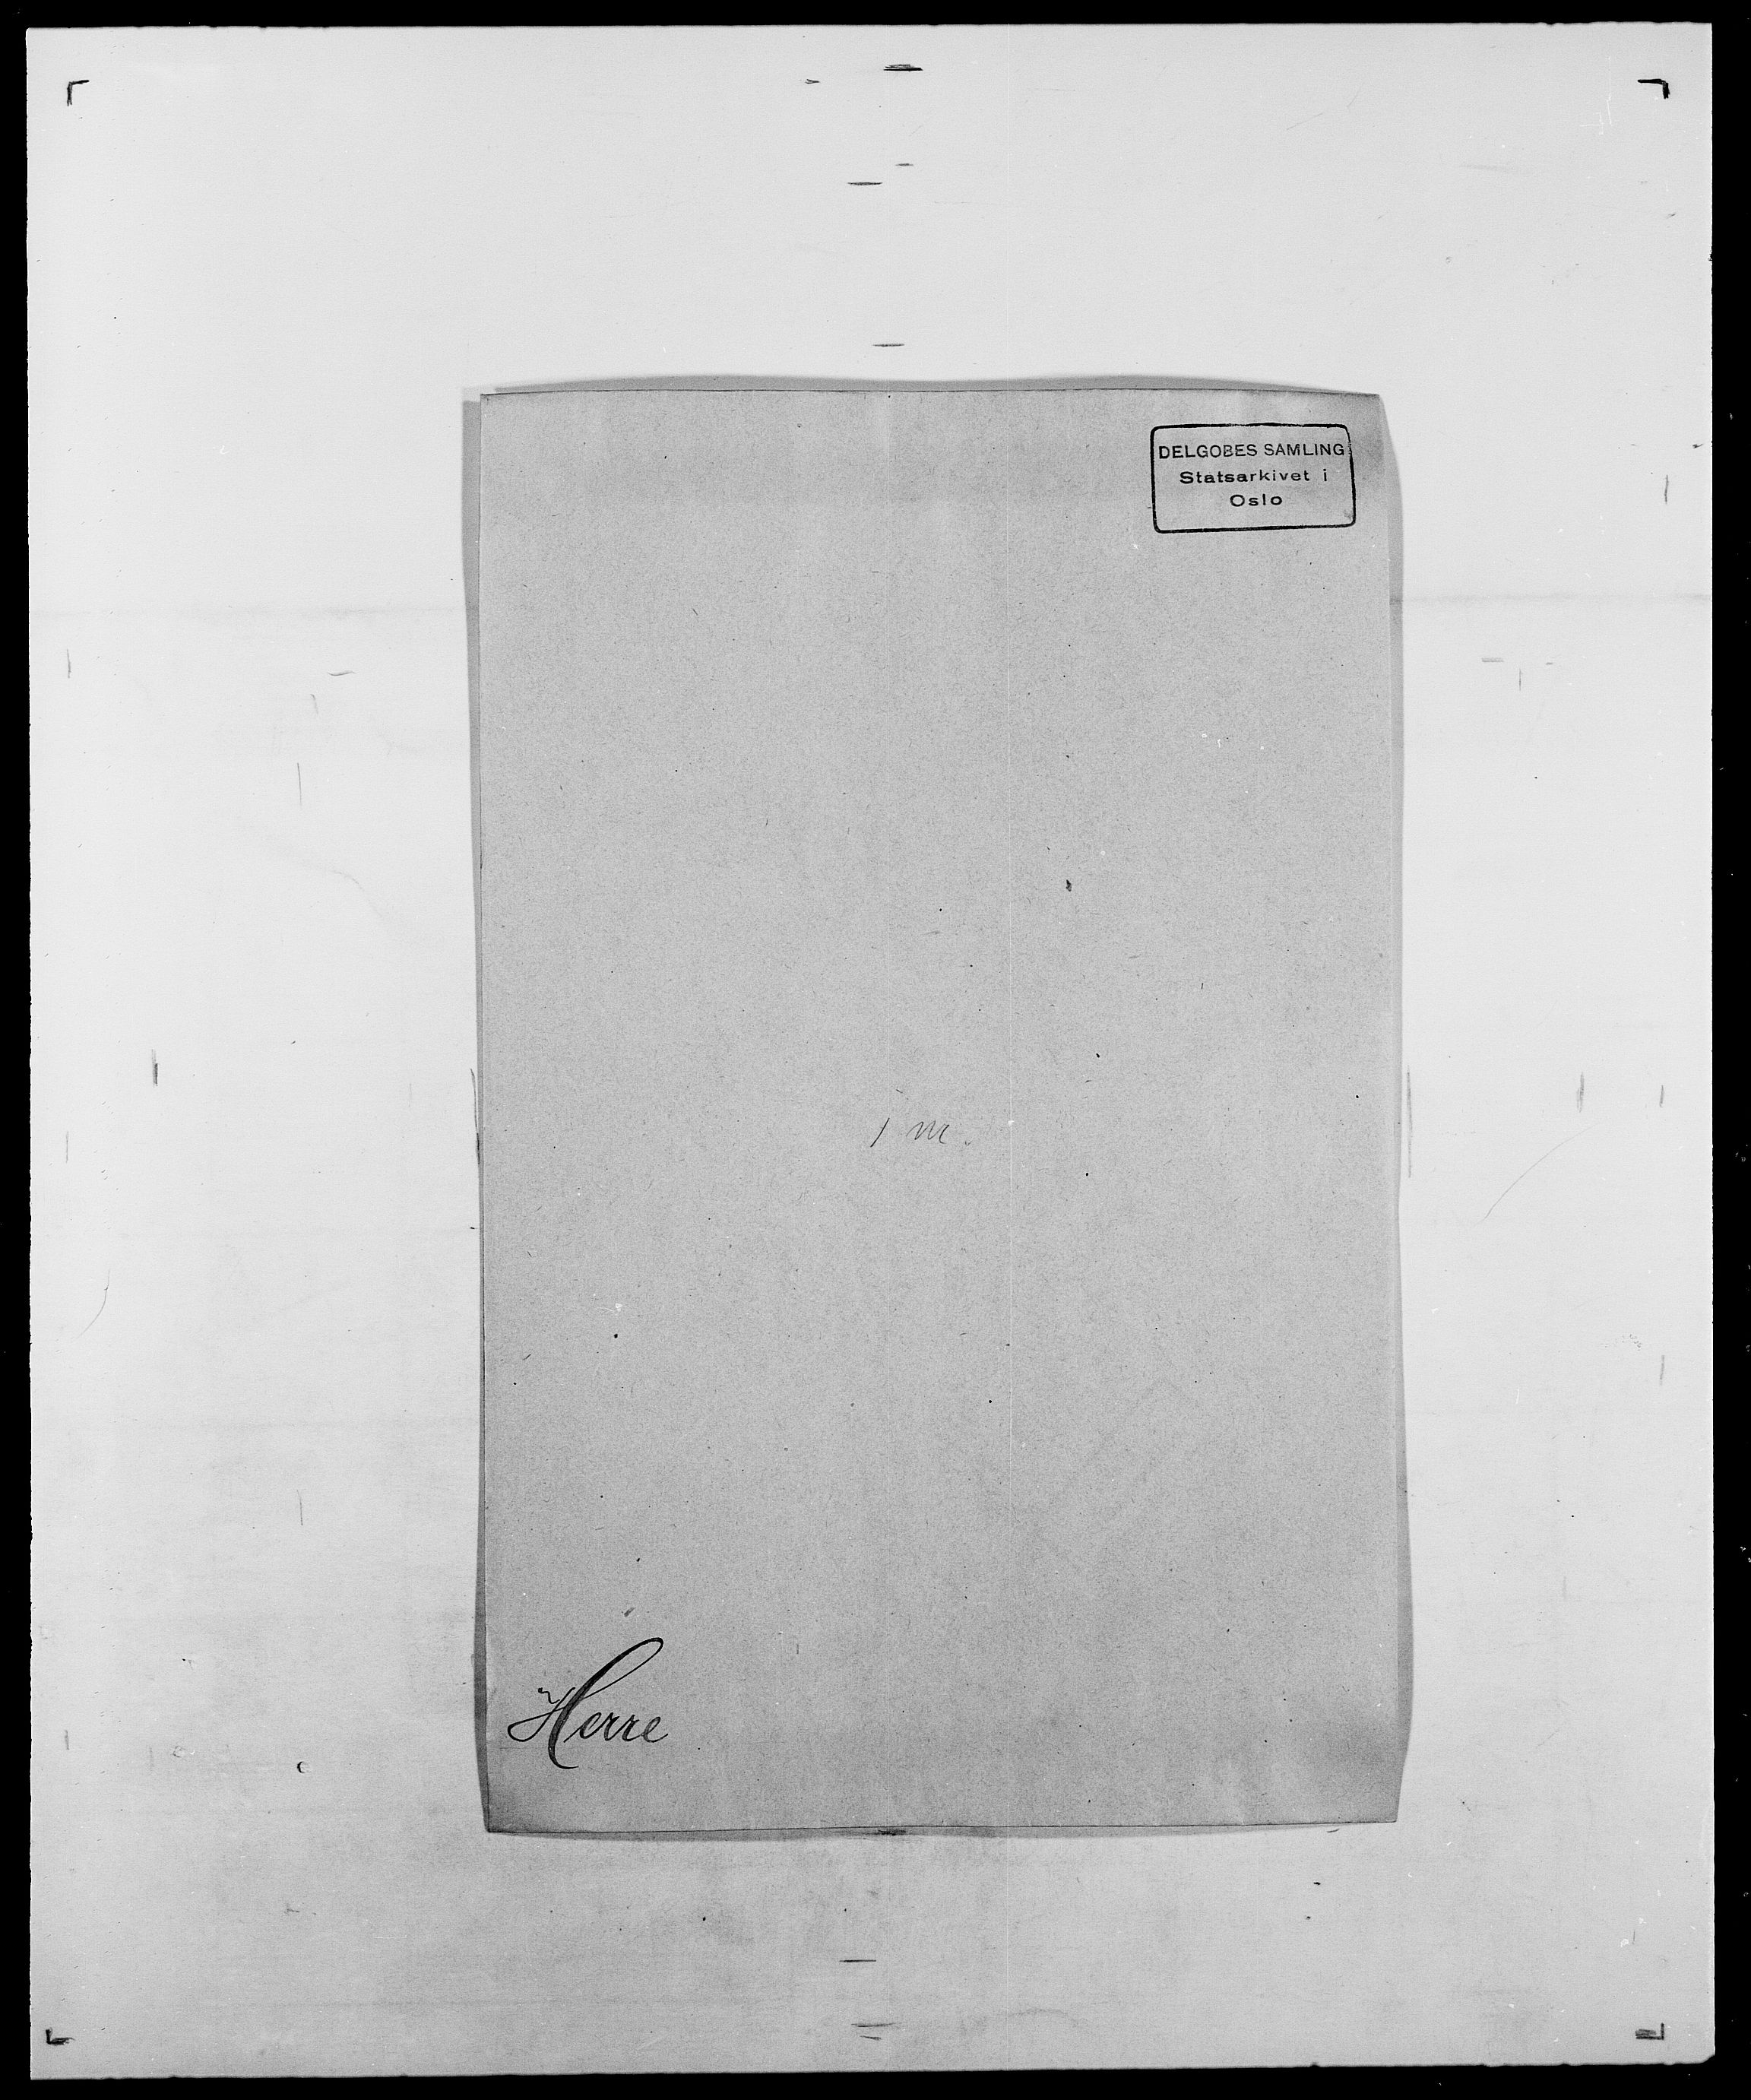 SAO, Delgobe, Charles Antoine - samling, D/Da/L0017: Helander - Hjørne, s. 255